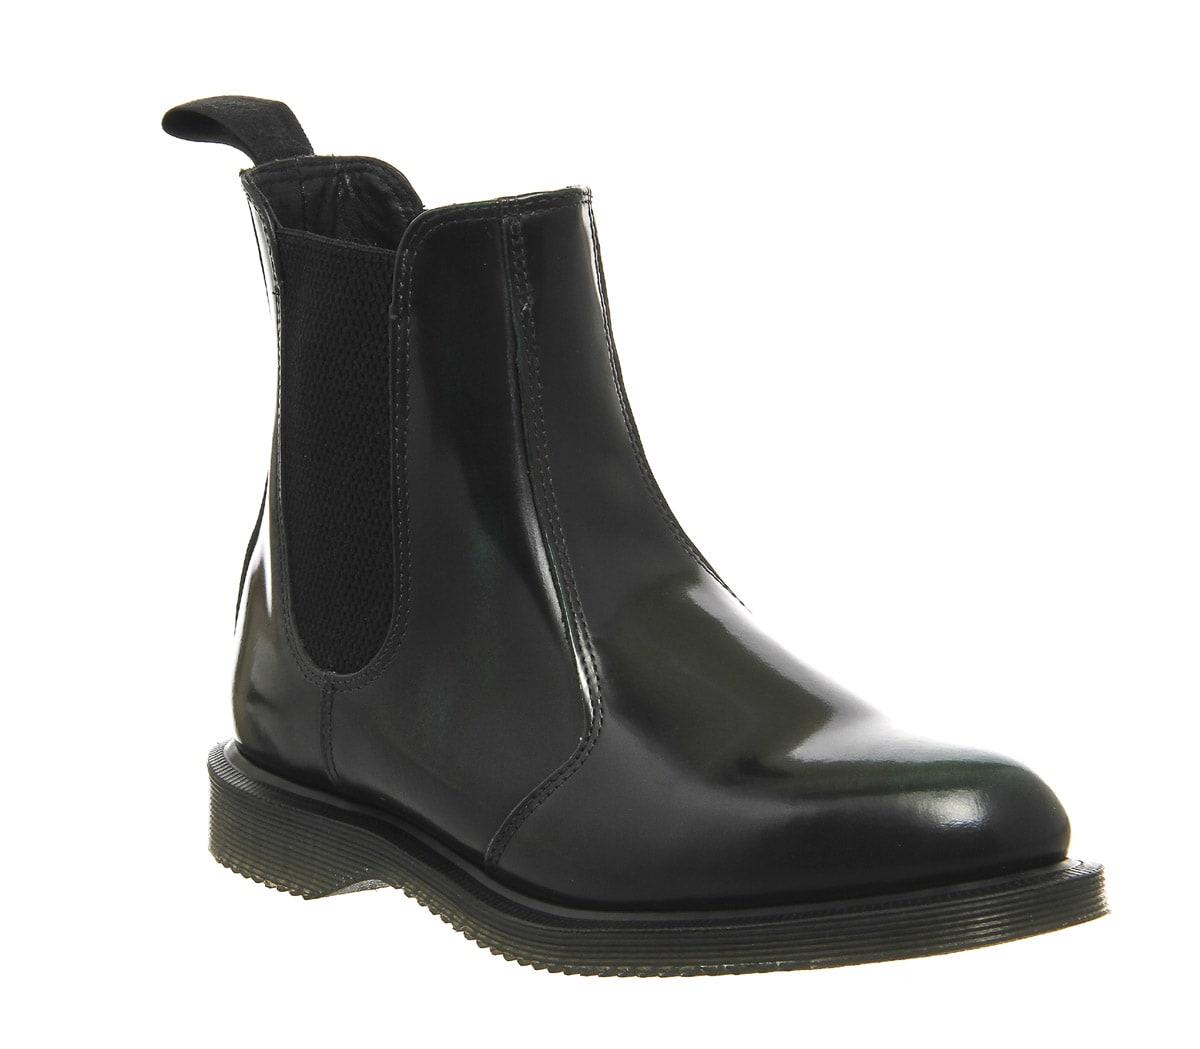 Womens Dr. Martens Kensington Flora GREEN ARCADIA LEATHER Boots | eBay